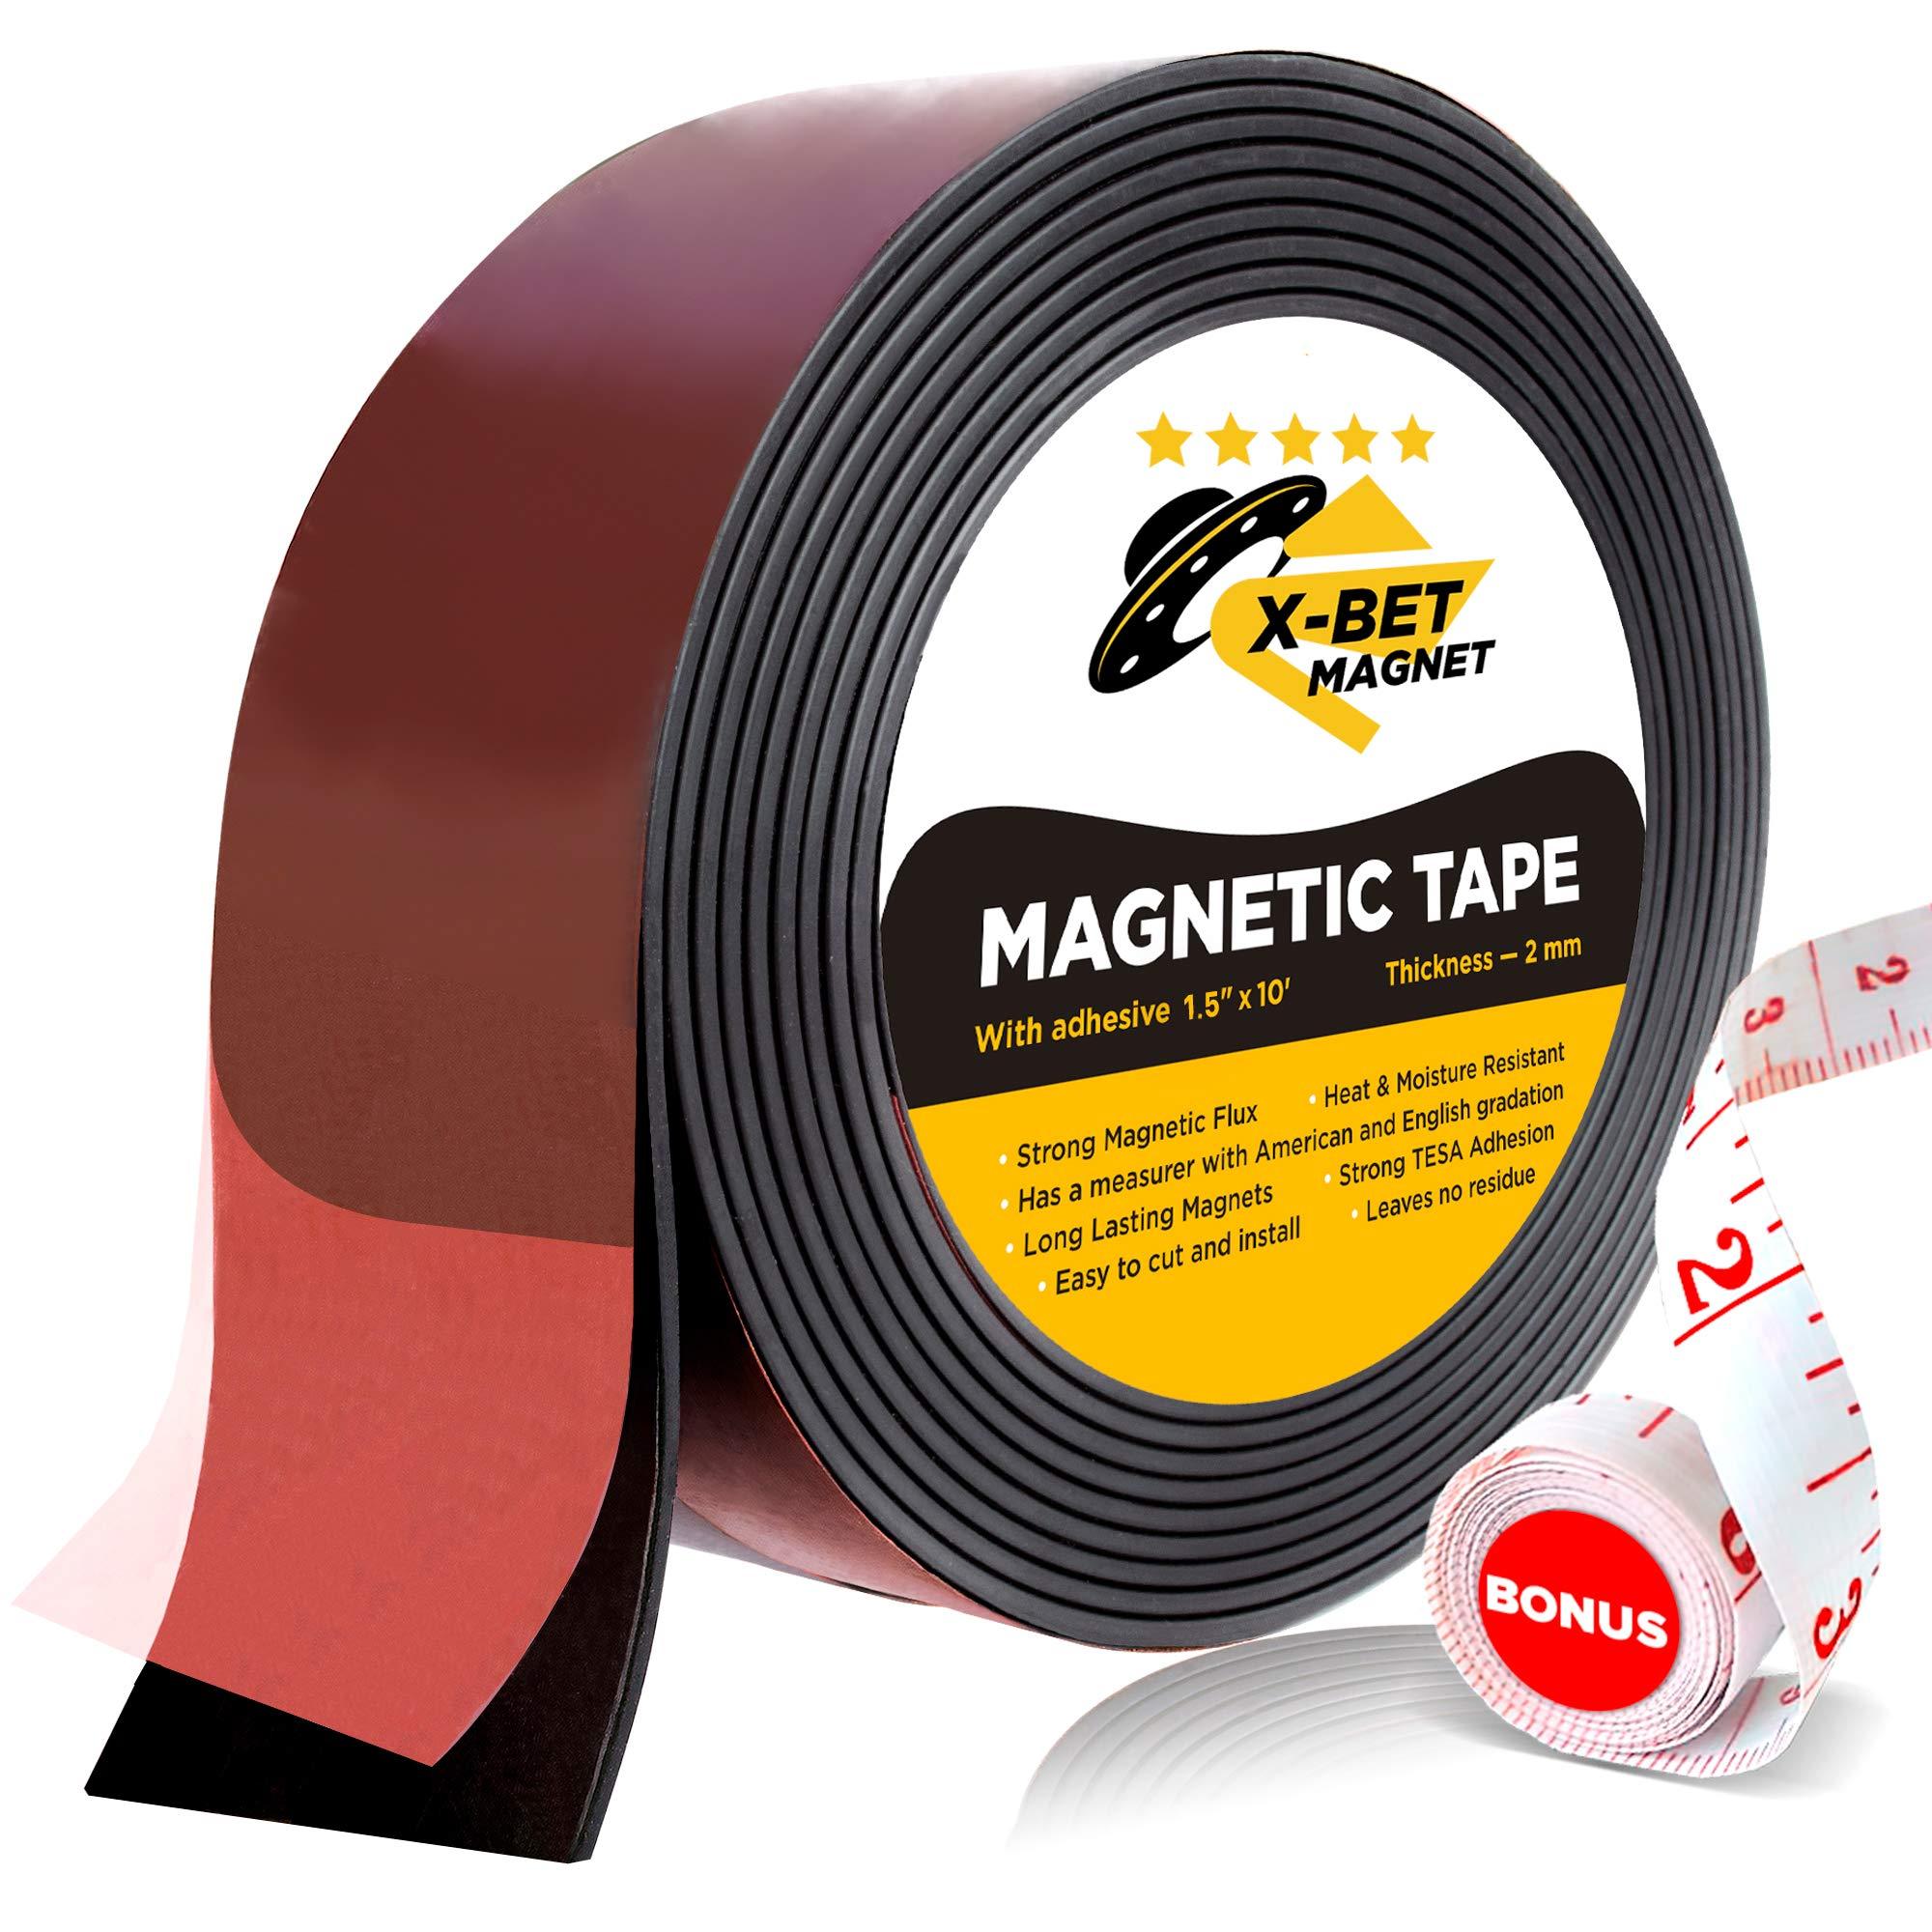 Magnetic Warehouse Label Holder Flexible Magnet Data Card Plastic Strip Kit for Stock Labeling 125.9-Inch Long Roll